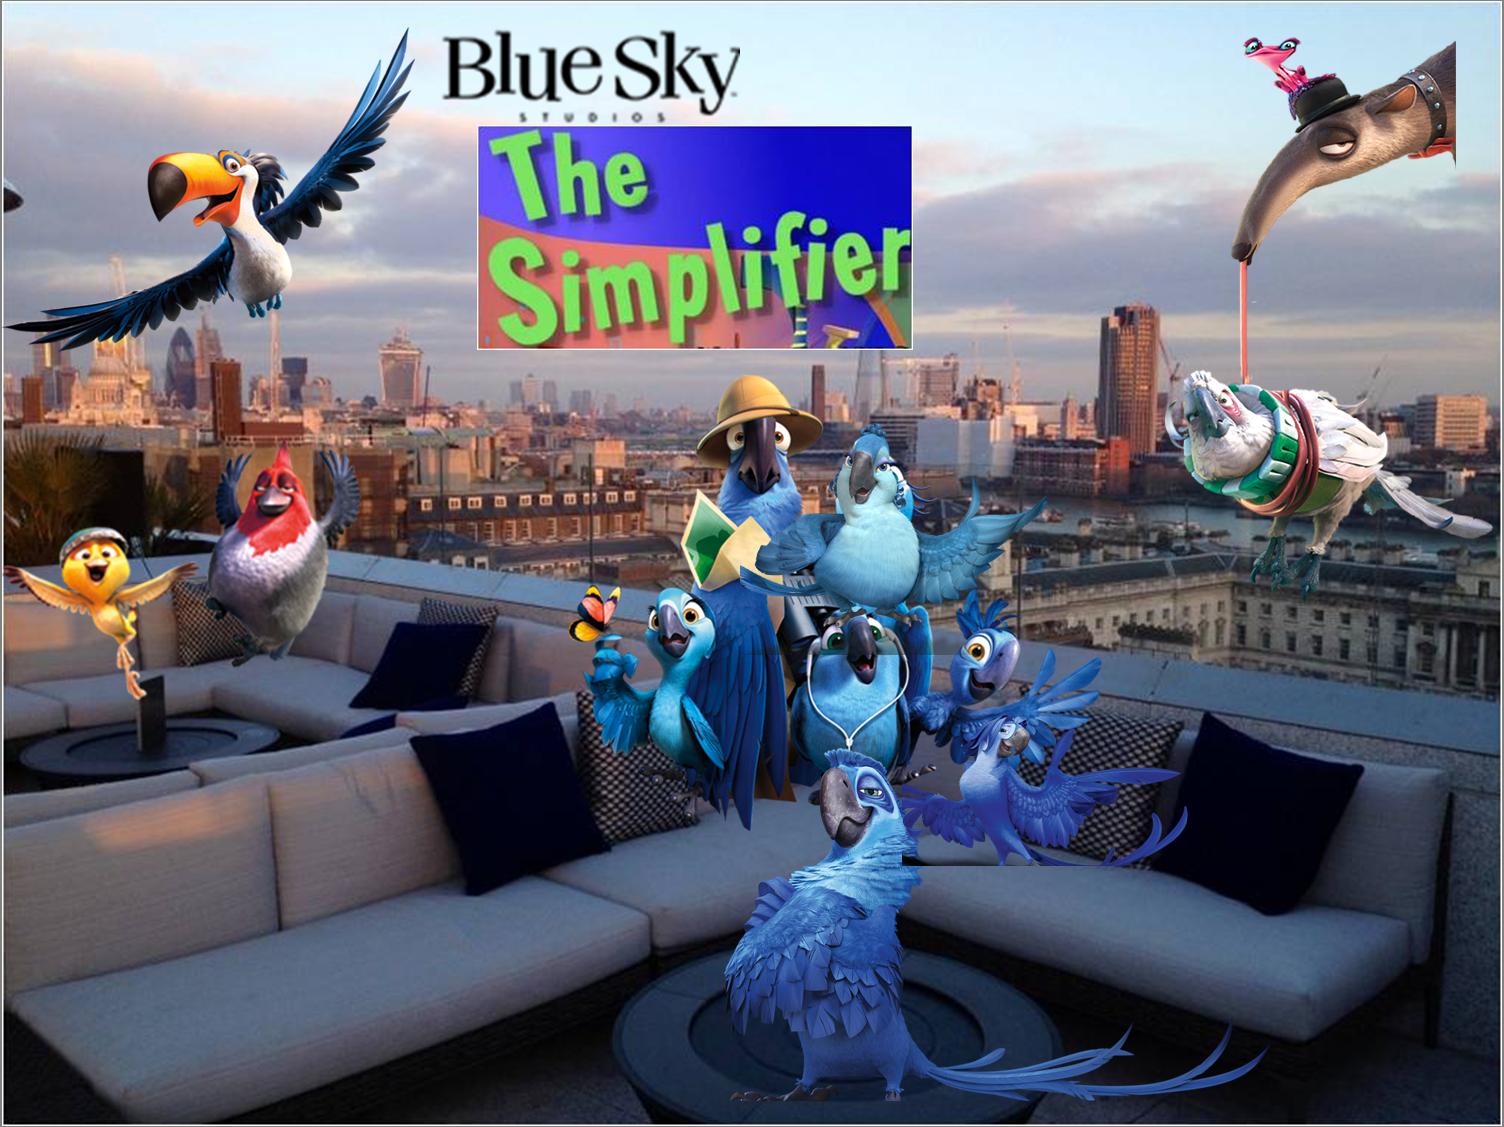 The Simplifier